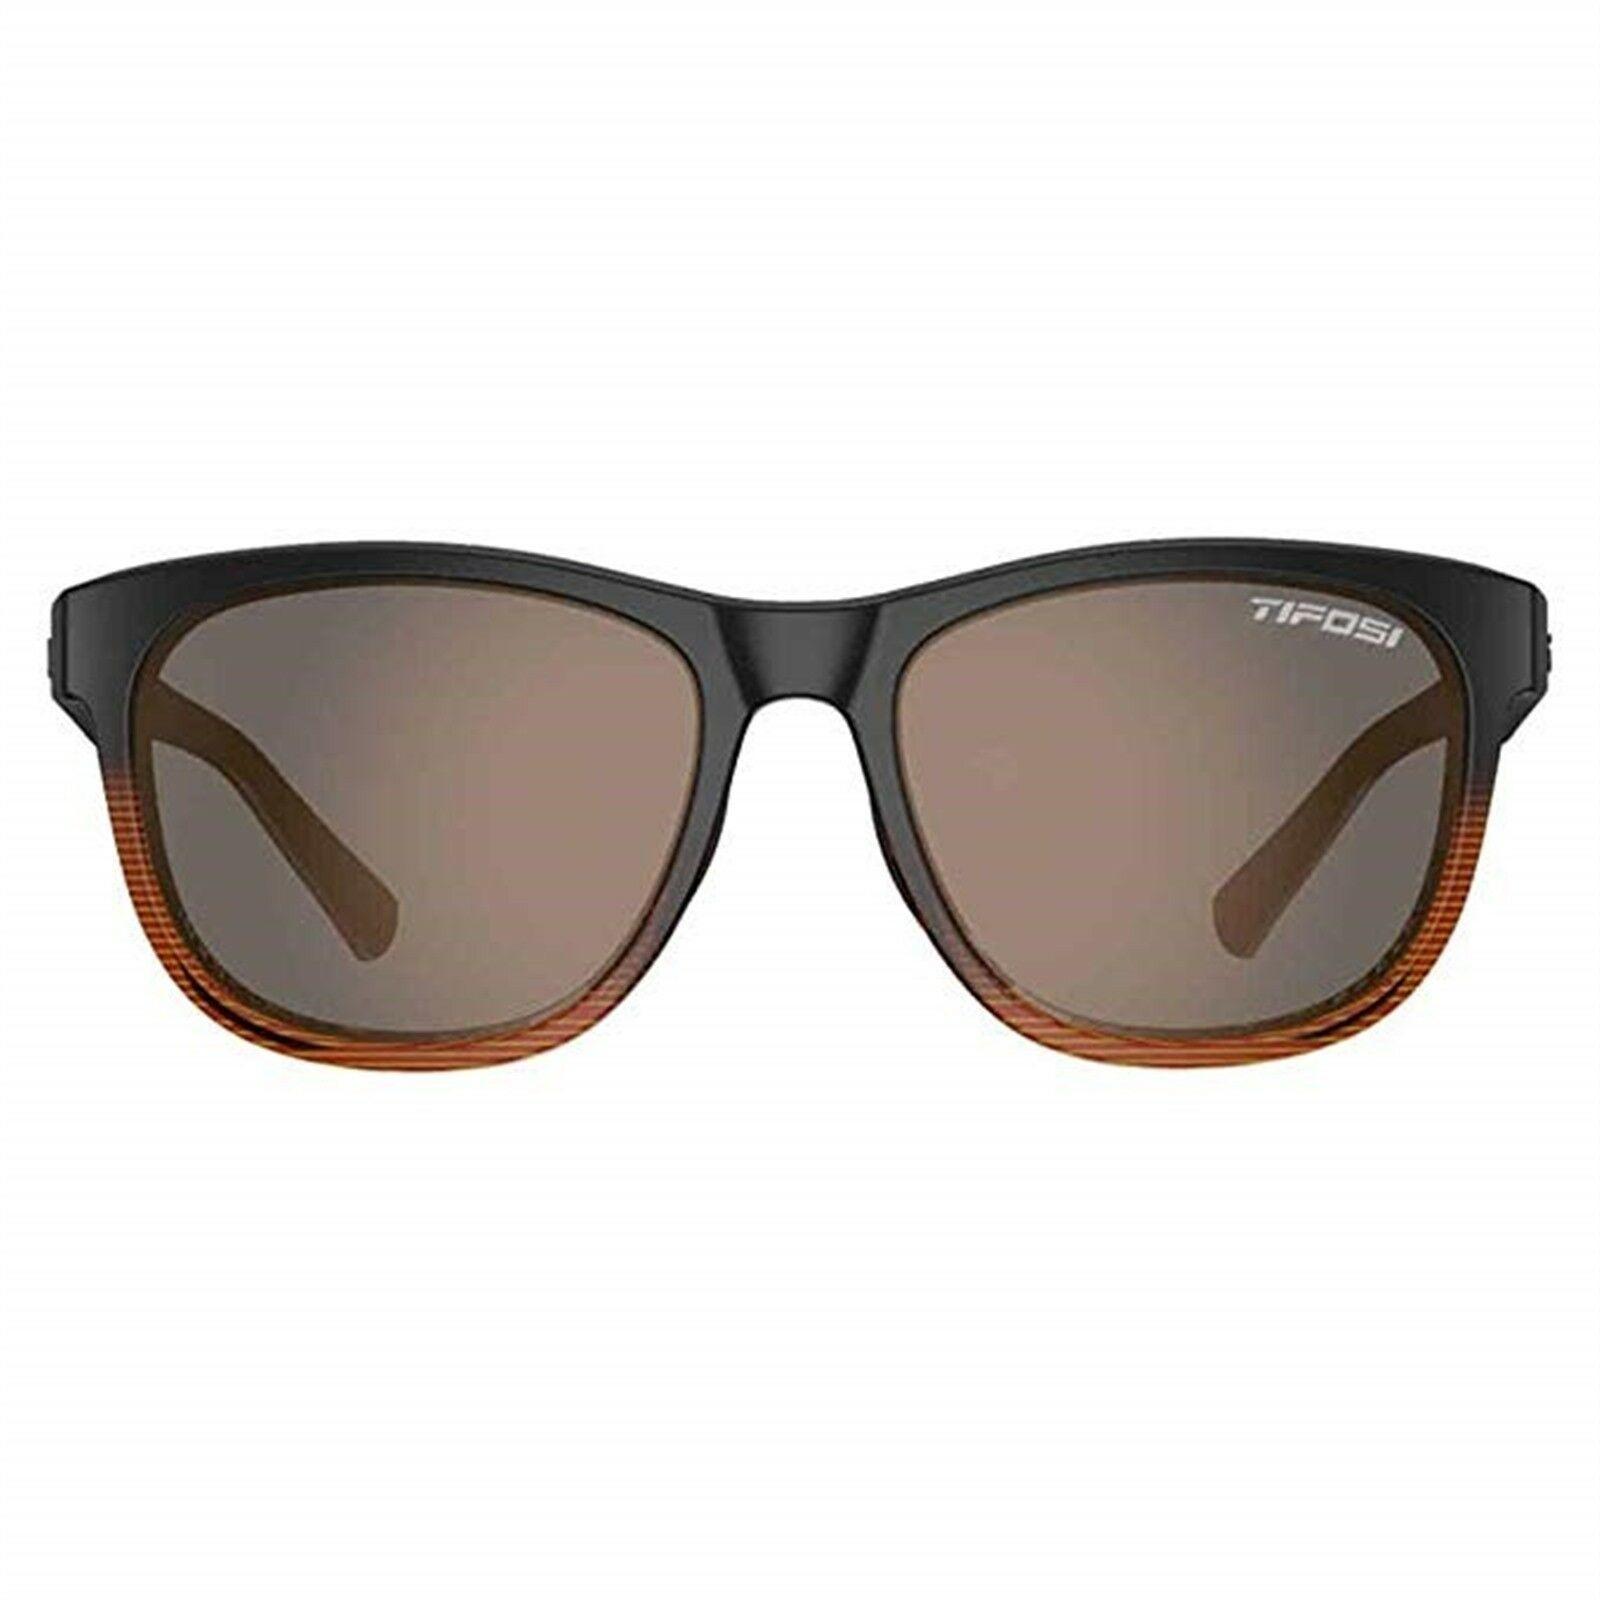 Smoke Silver Lenses Limited Edition# 41 Tifosi Hagen X Brown Fade